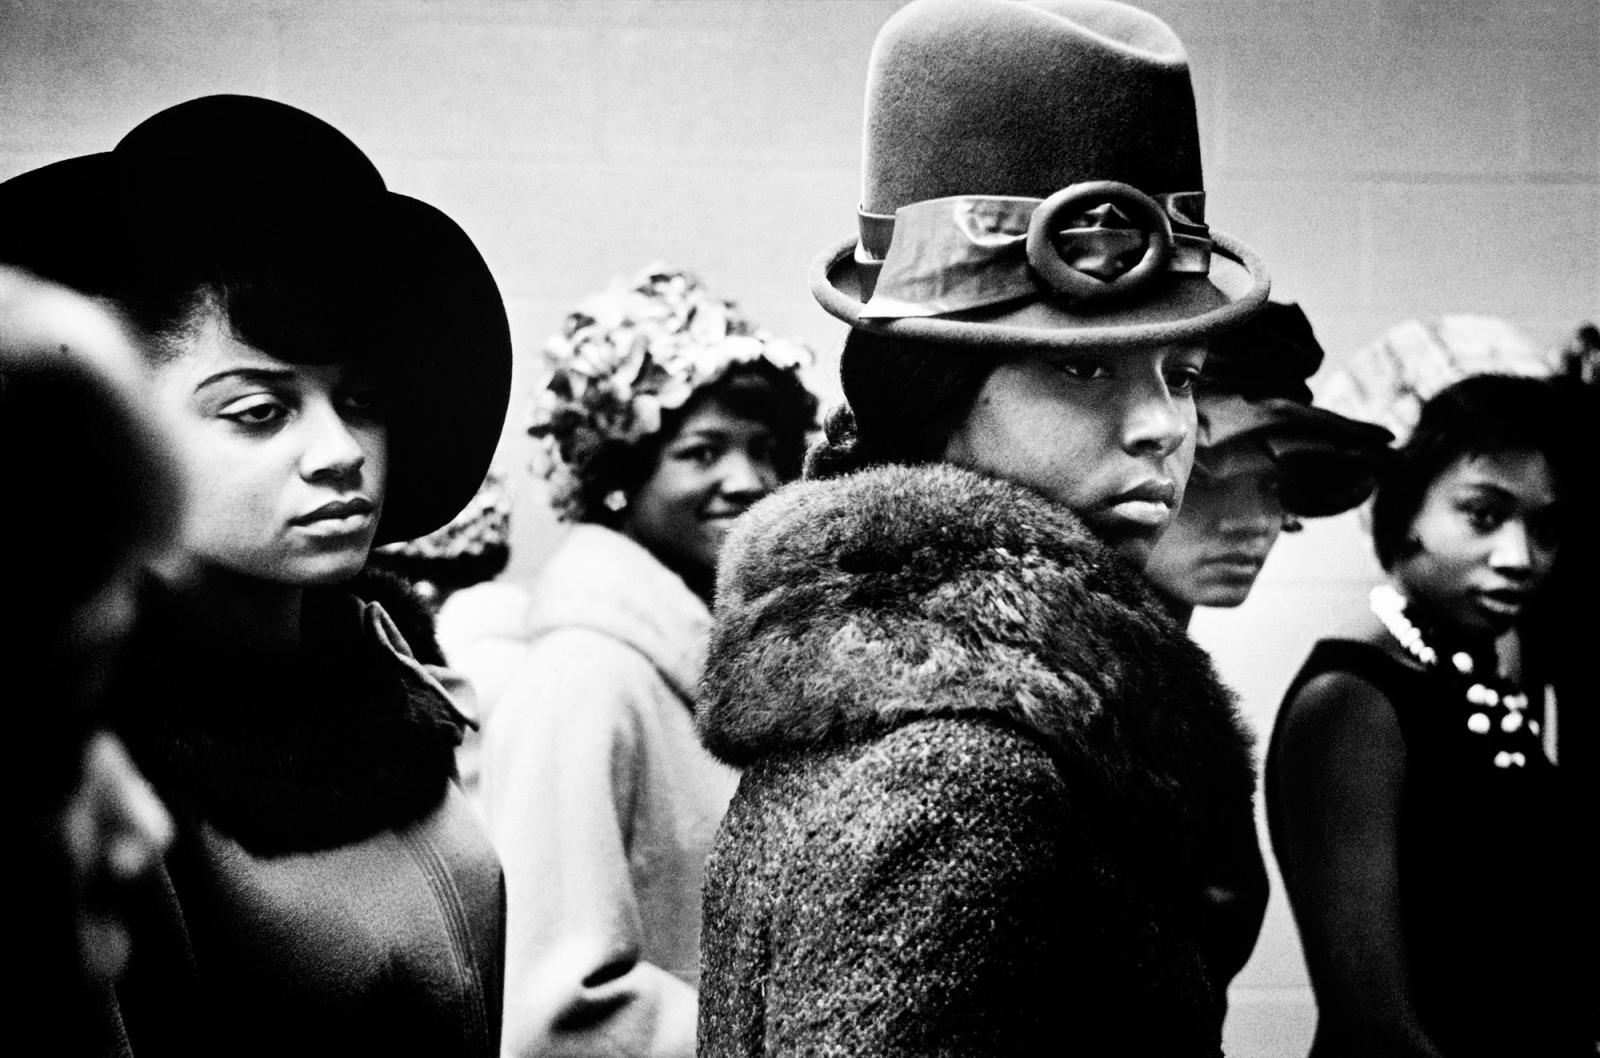 Leonard Freed, Harlem fashion Show, 1963. ©Leonard Freed/Magnum Photos